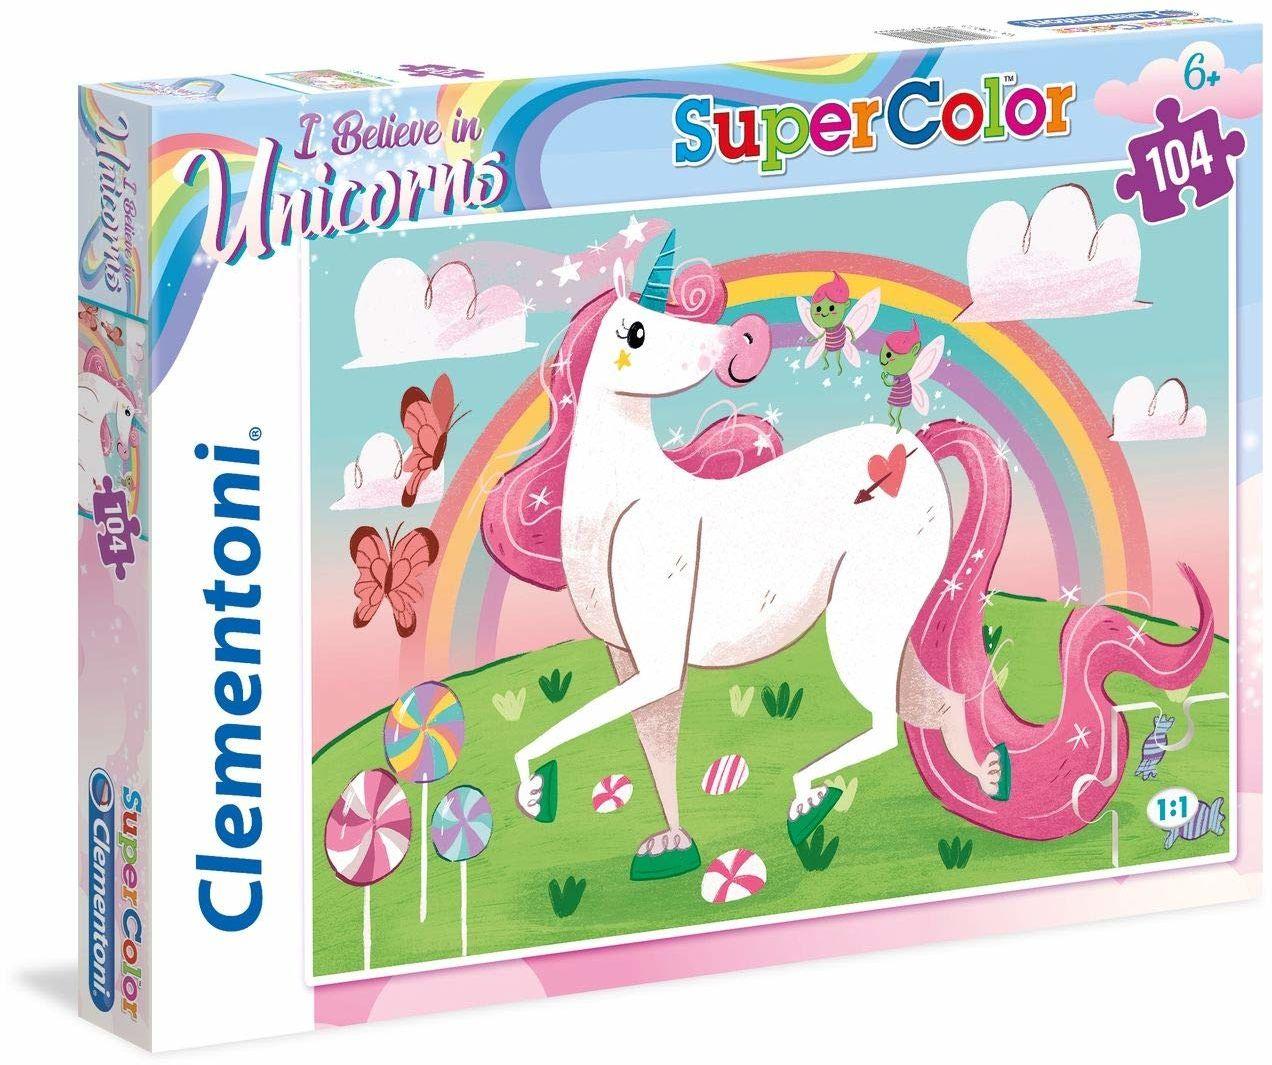 Clementoni 27109 Clementoni-27109-Supercolor-Unicorno Brilliant-104 Pièces 27109-Supercolor Jednorożec Genialny - Puzzle 104 sztuk, wielokolorowy